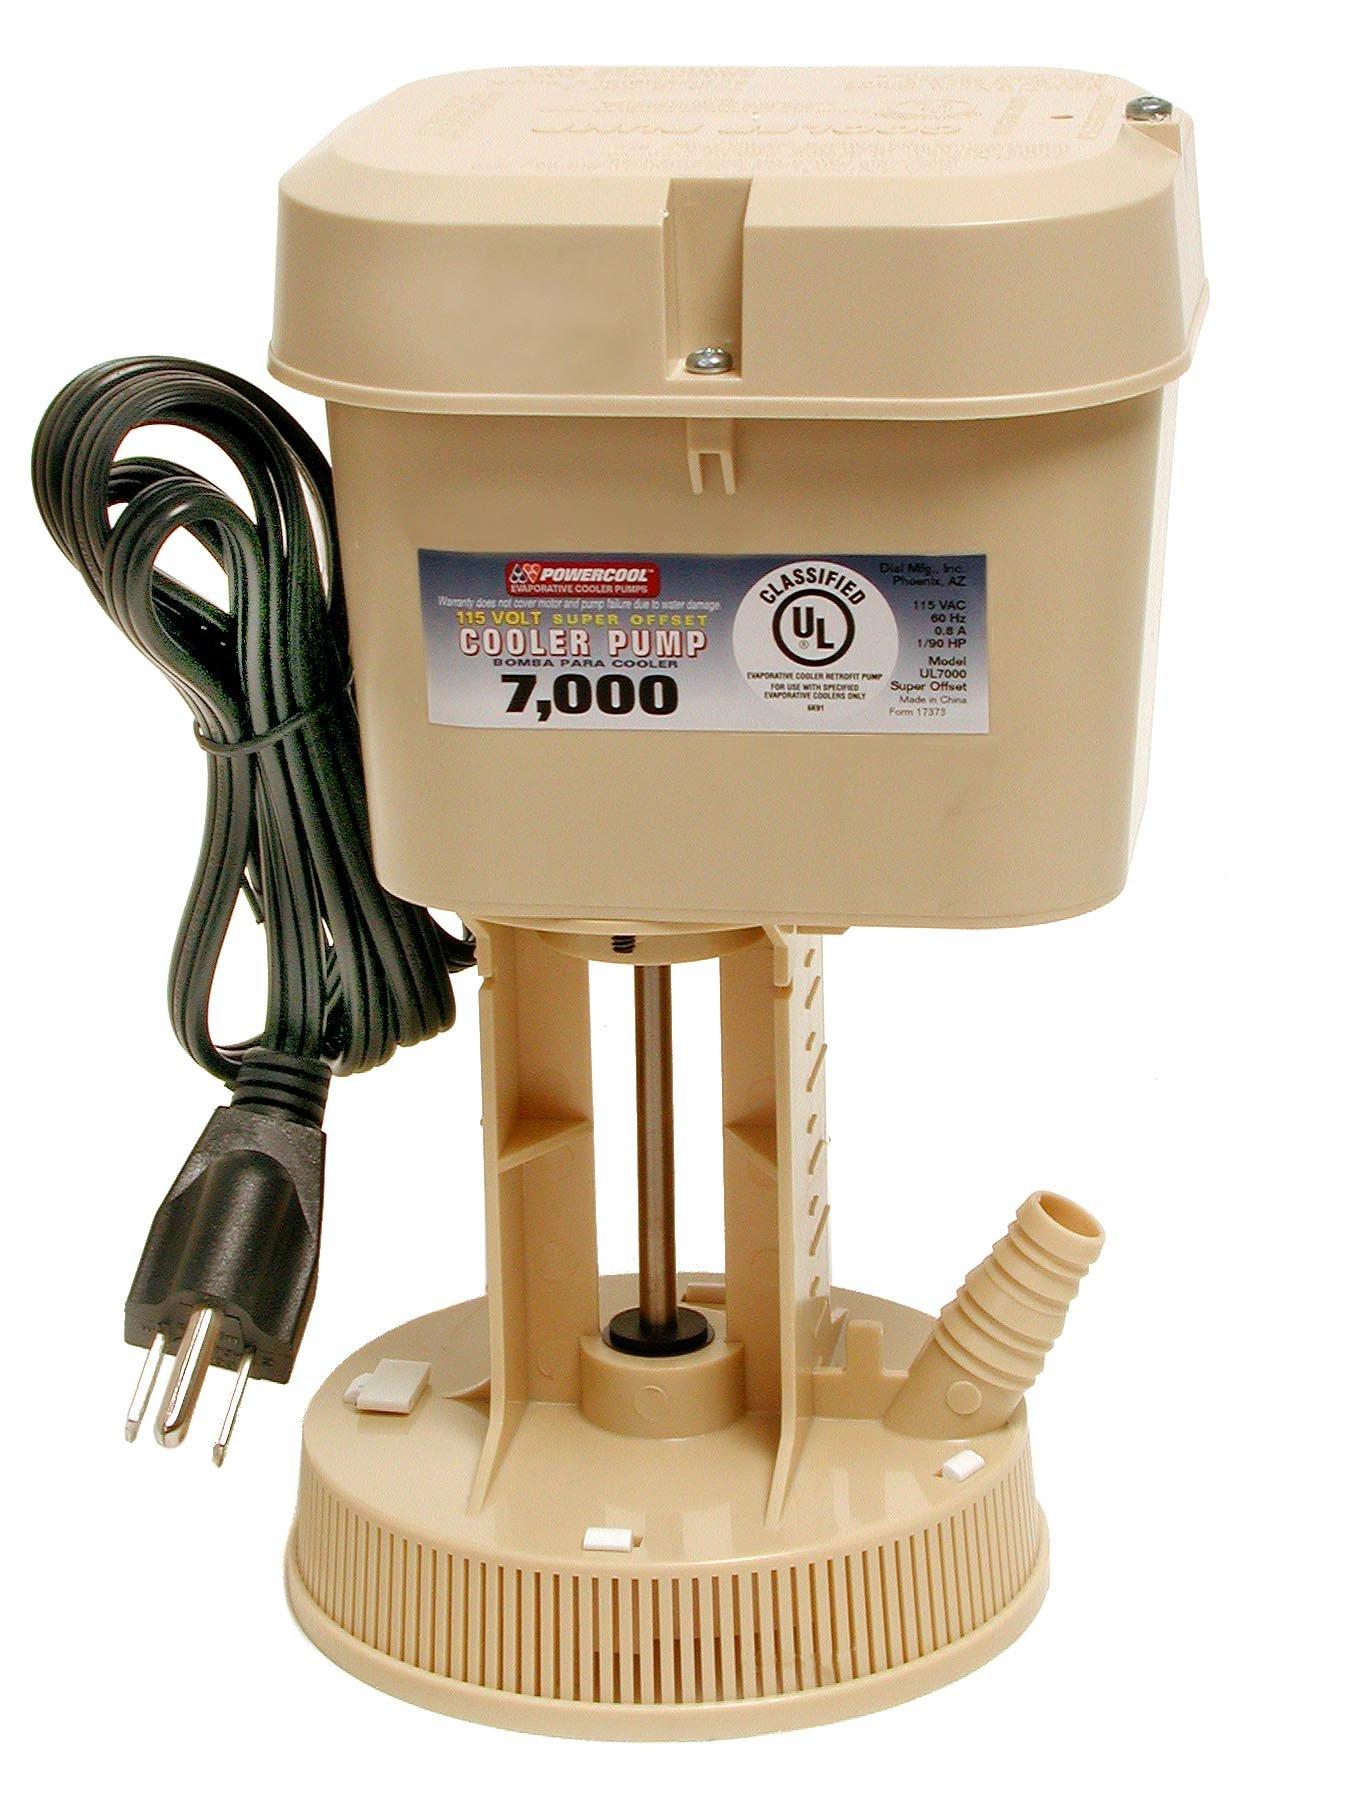 Dial 1075 Mfg Inc. # 7000 CFM Offset Pump